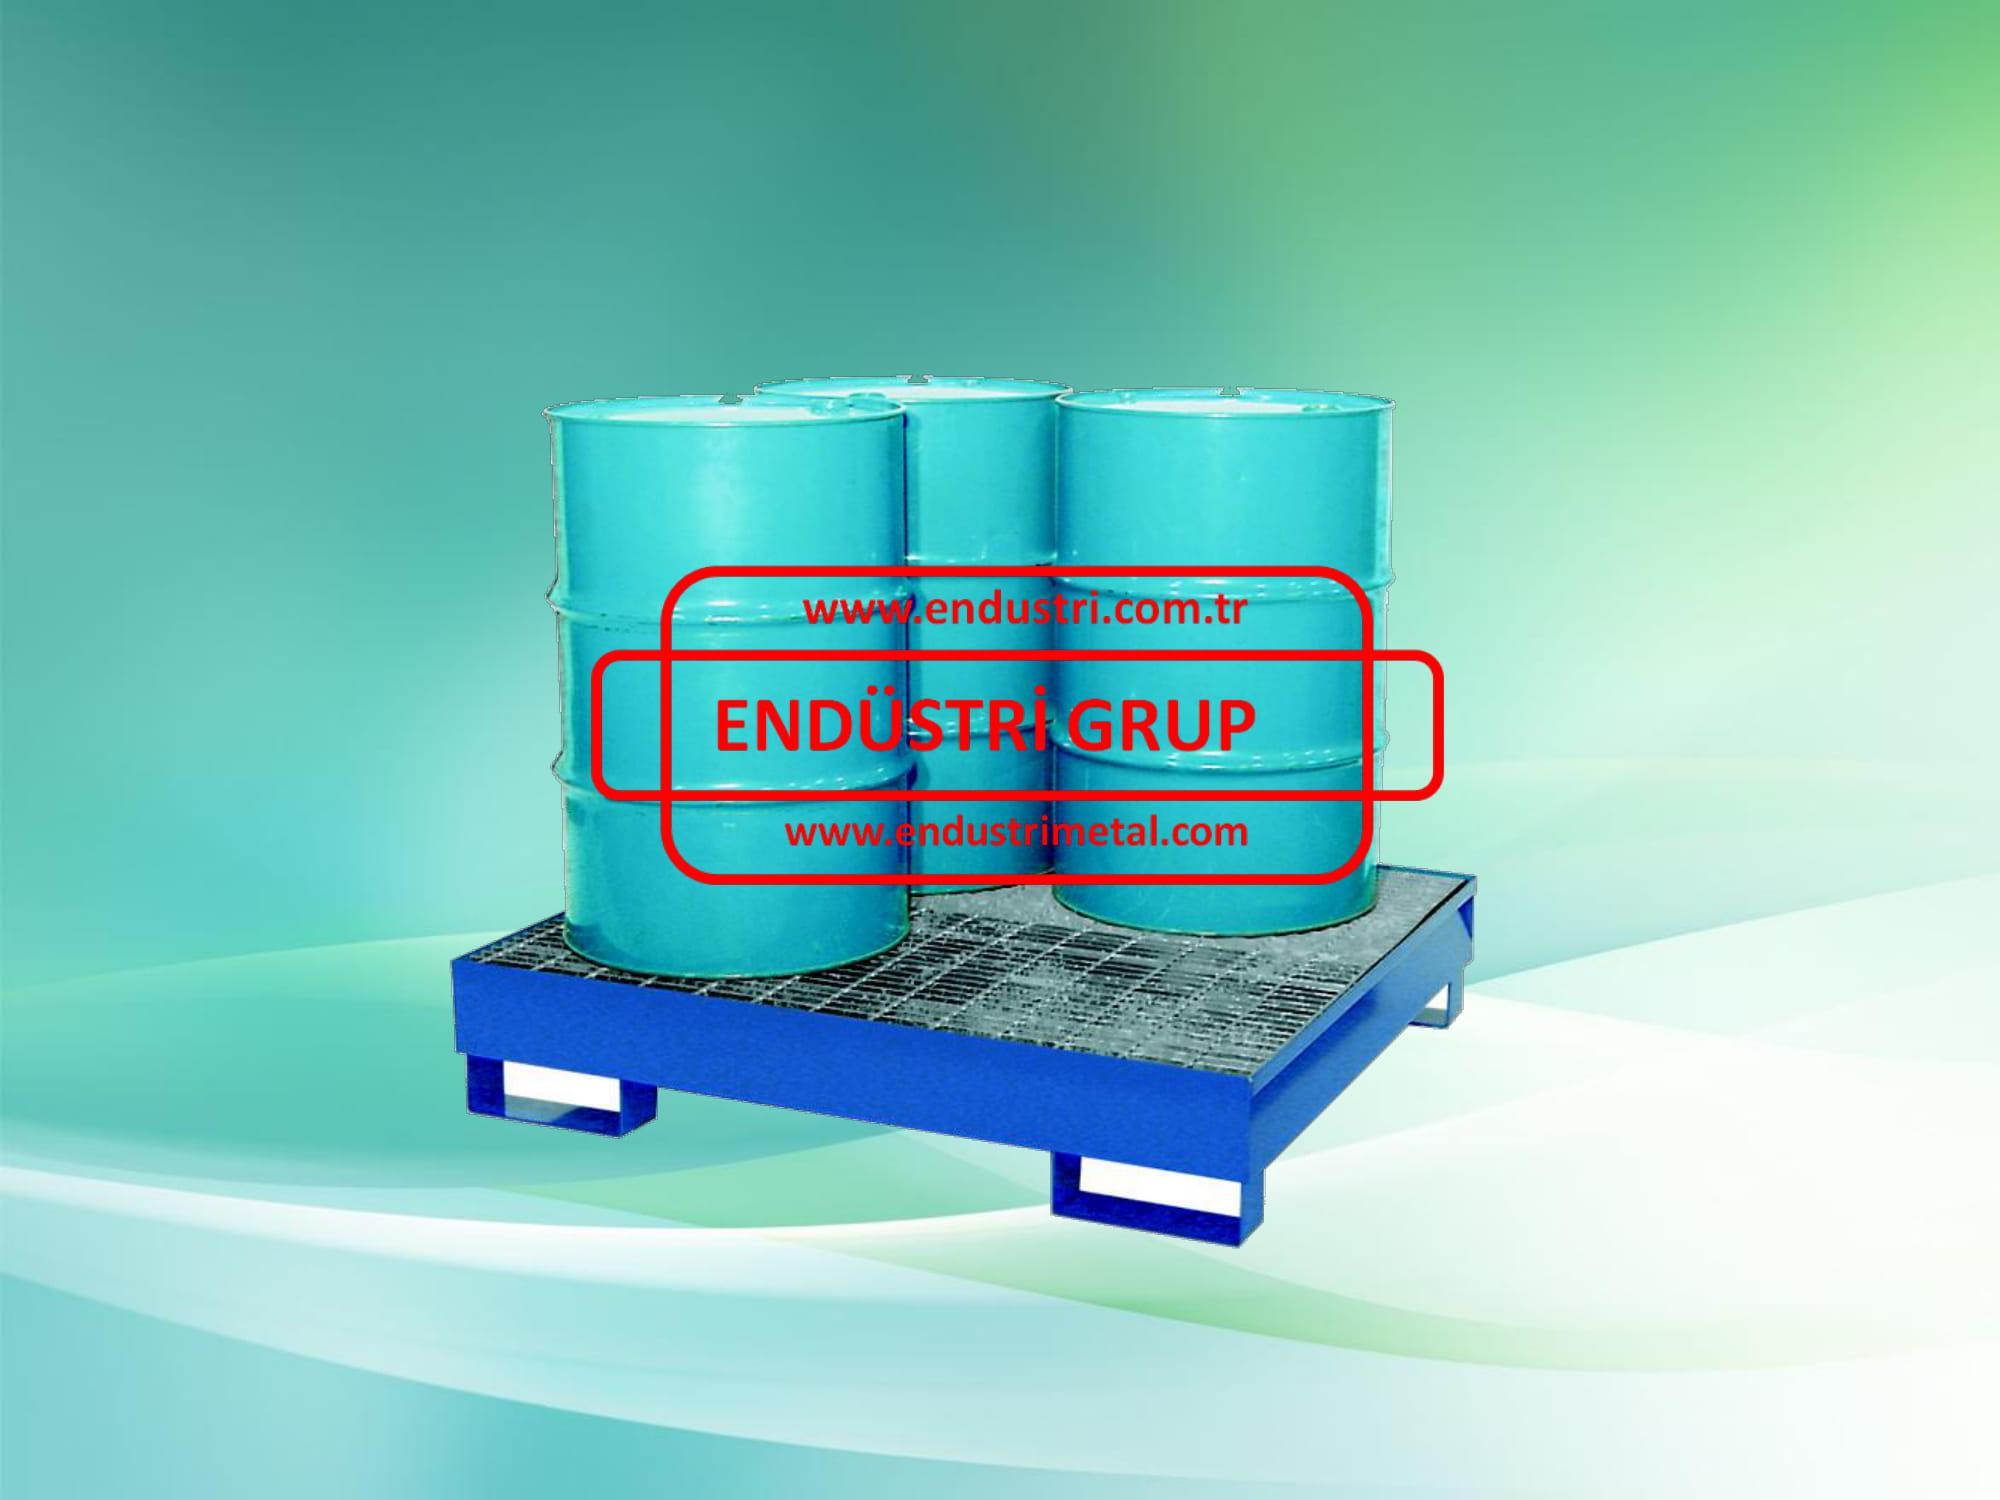 dokulme-sizinti-acil-mudahale-kaplari-tank-konteyner-icin-celik-toplama-kuveti-varil-stoklama-icin-kuvetli-kimyasal-madde-dolaplari-icin-taban-kuveti